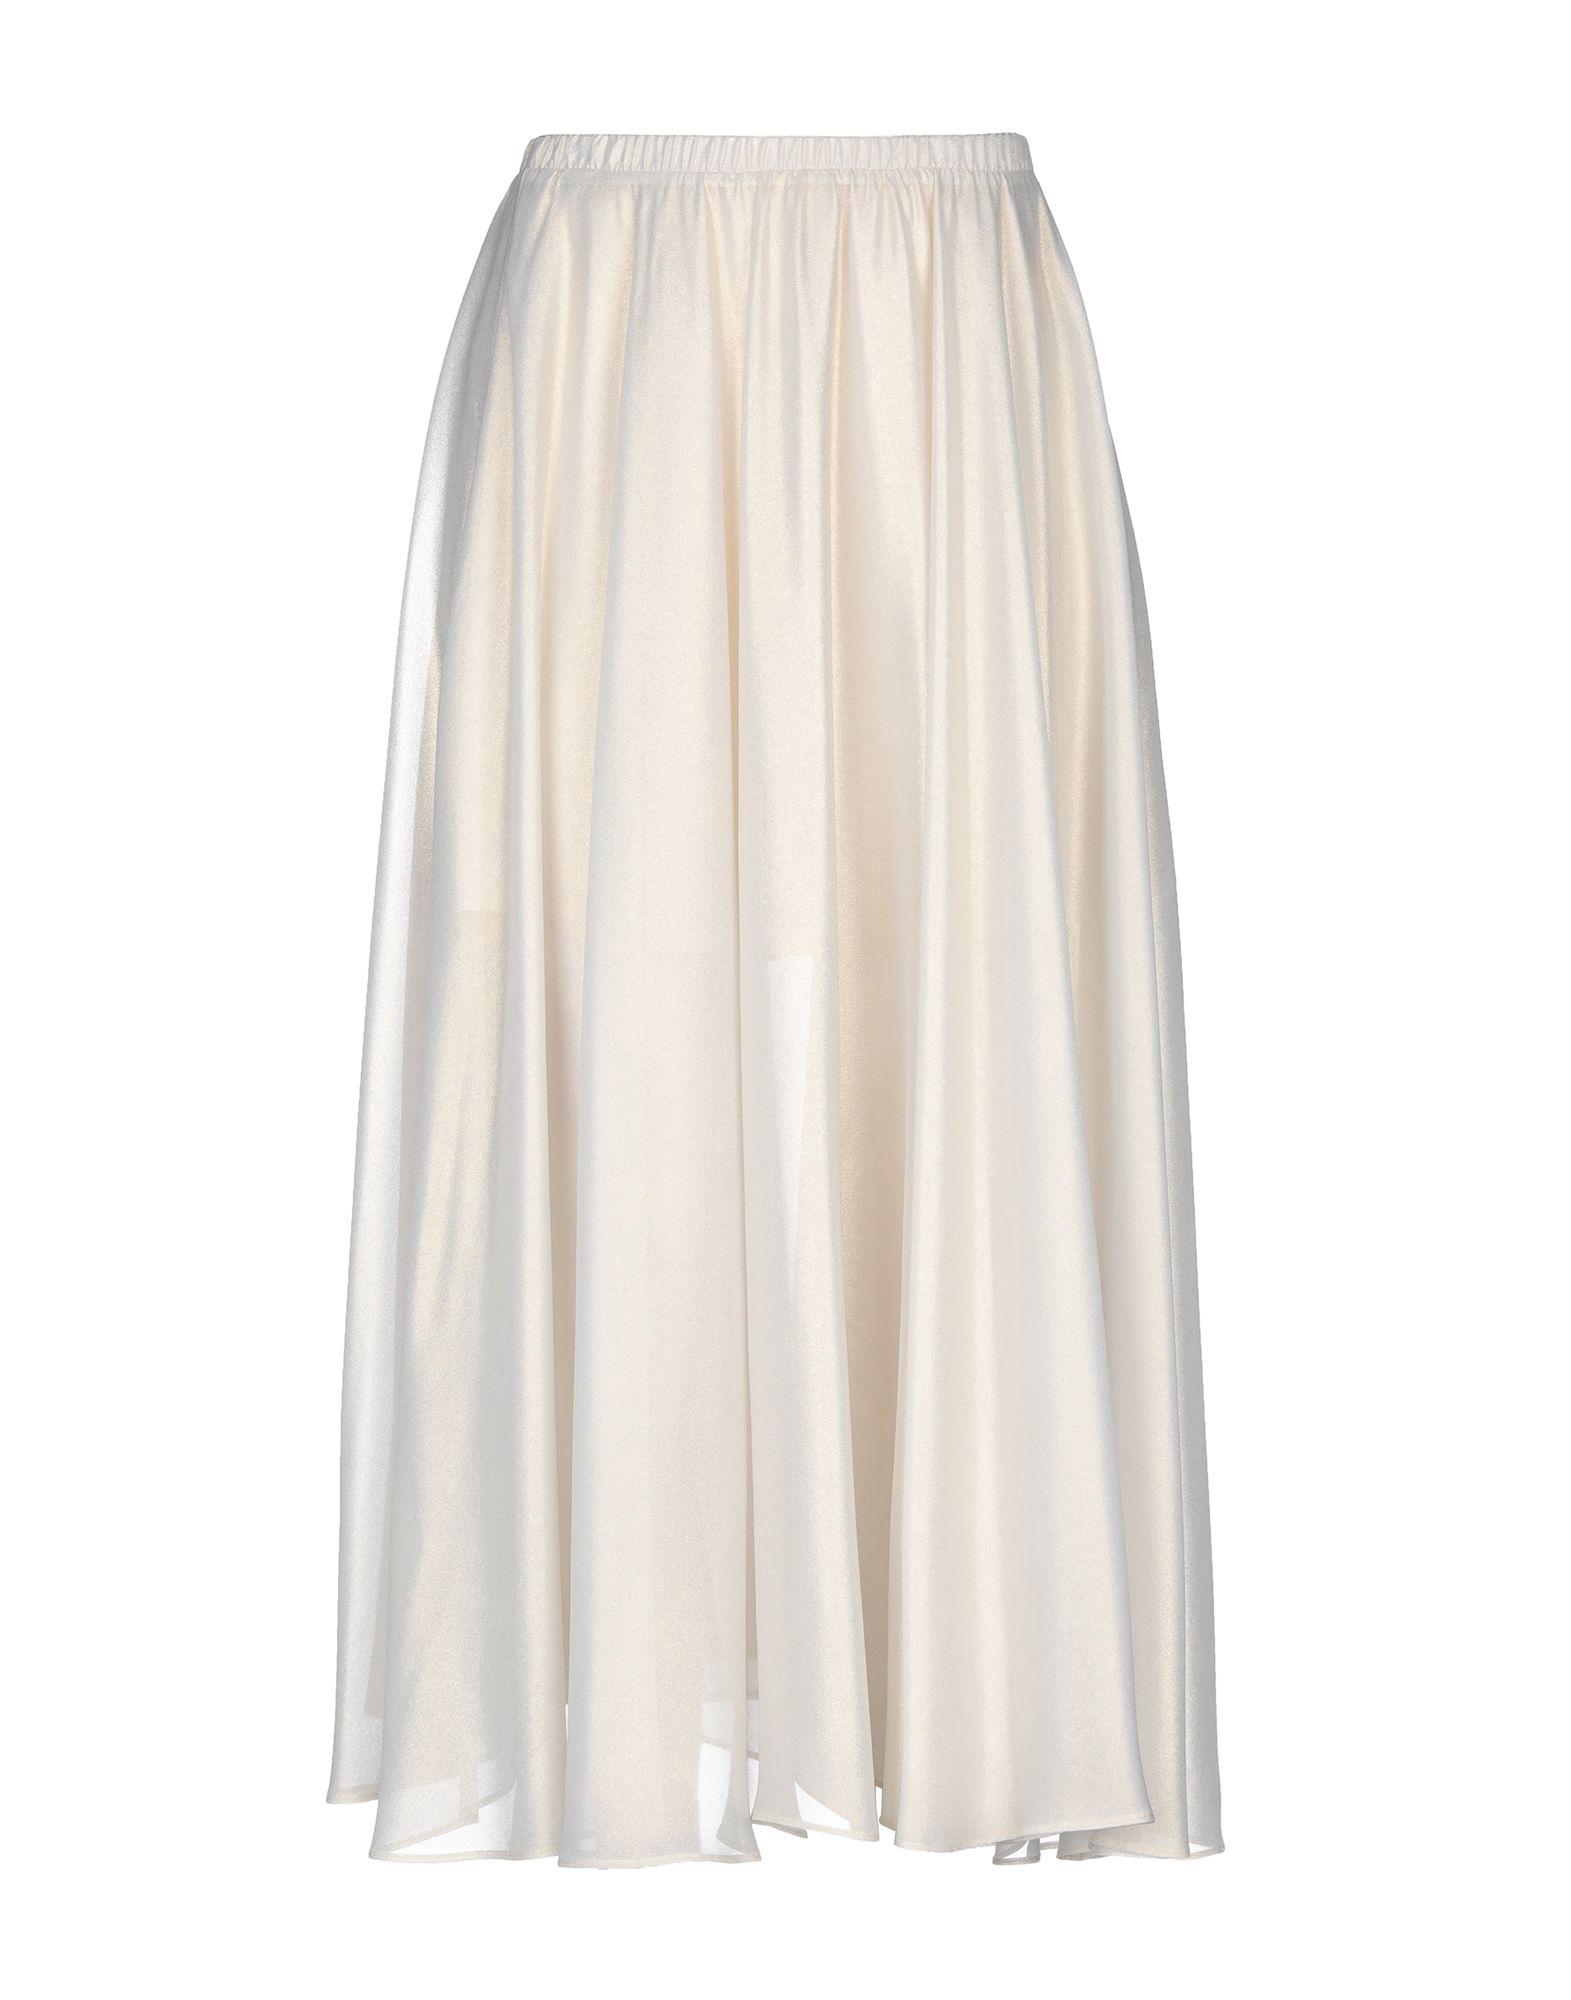 KATIA GIANNINI Длинная юбка katia g длинная юбка